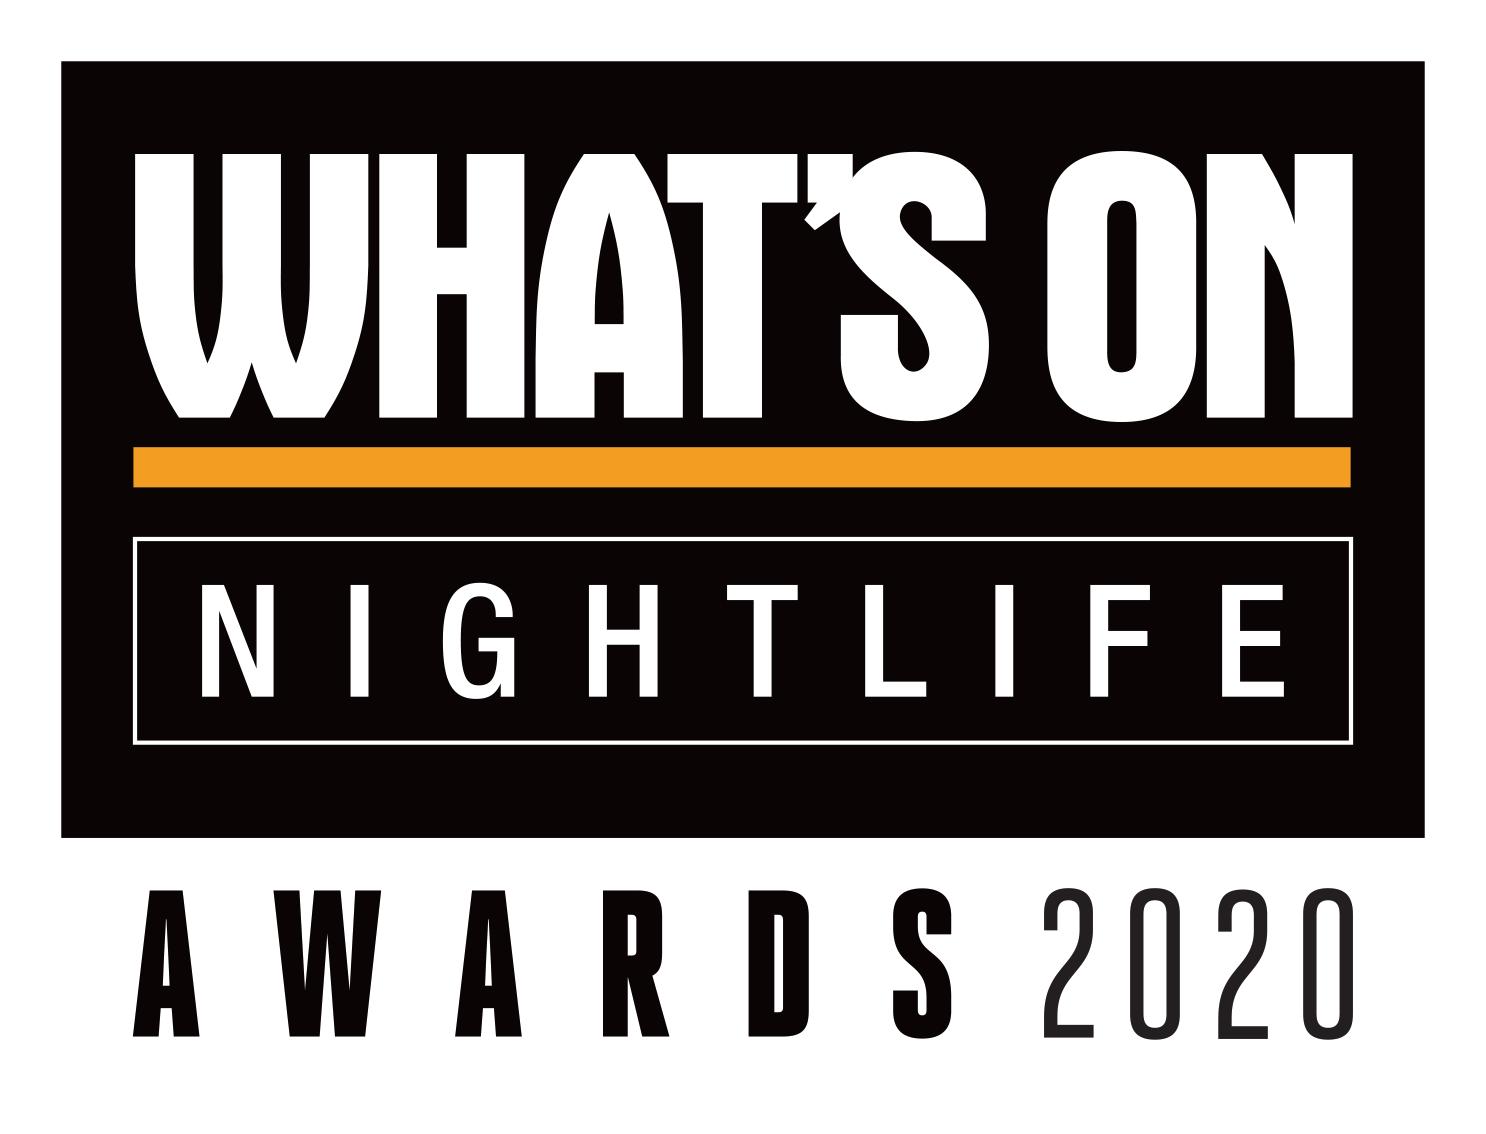 nightlife logo icon